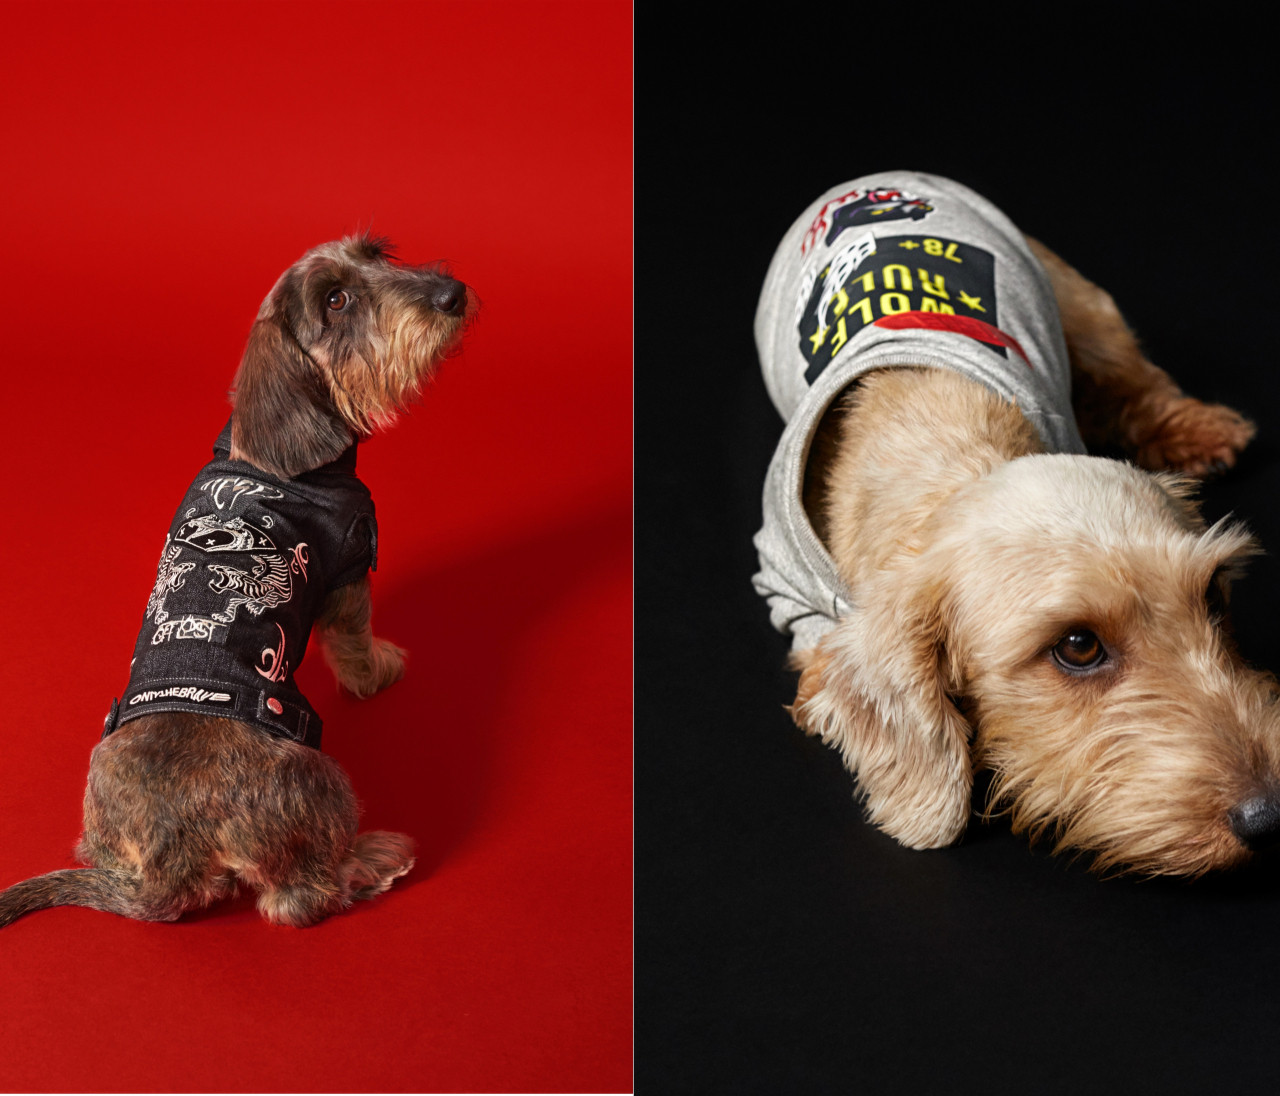 【DIESELから初のドッグウェアコレクションが登場】クールなエッセンスを愛犬にも♡